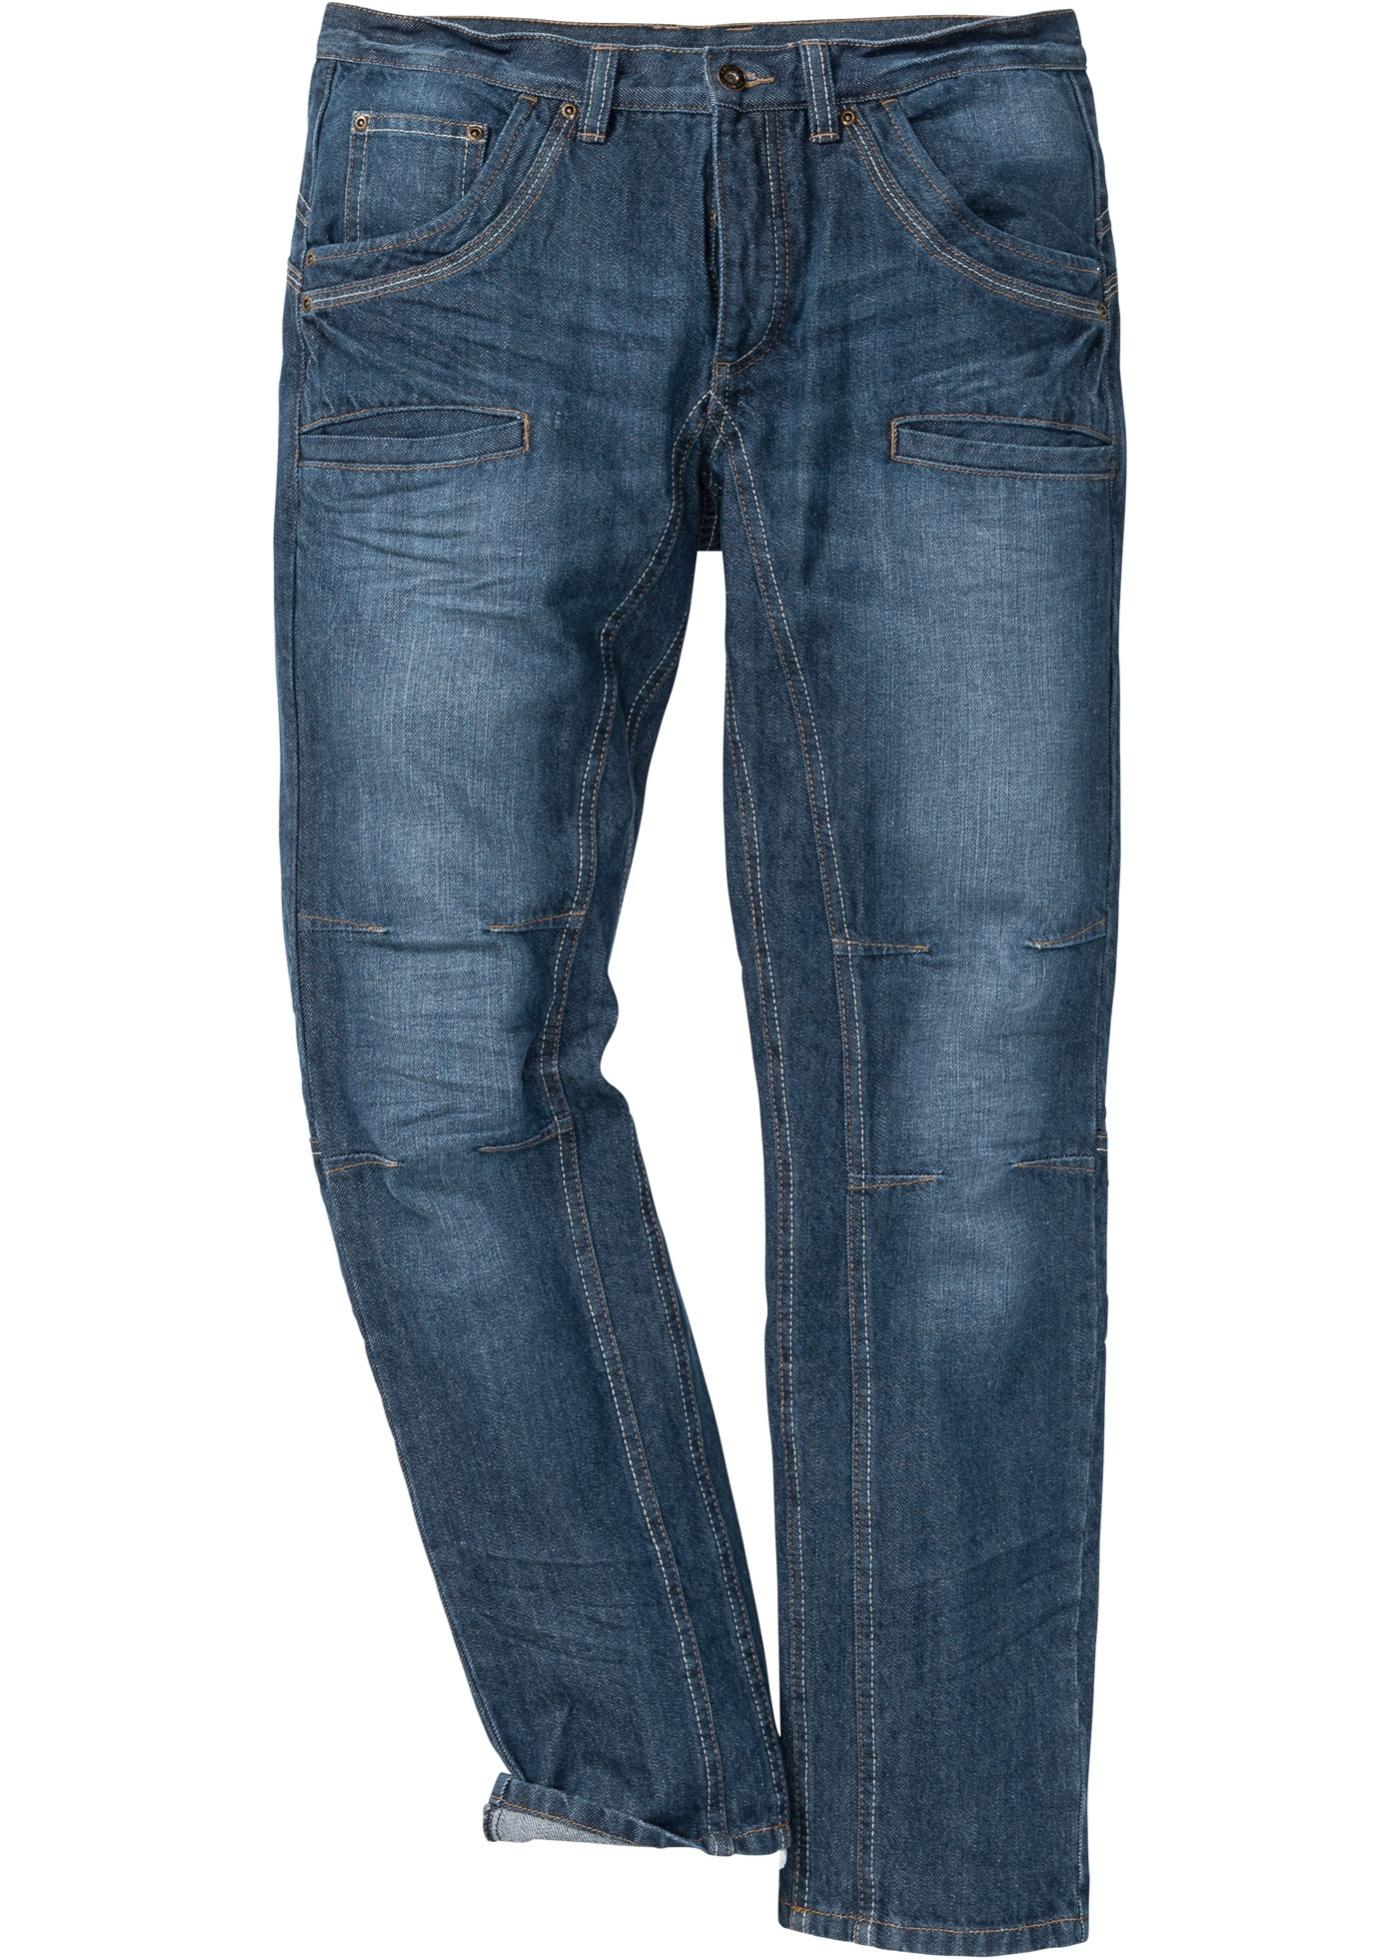 Bonprix SE - Jeans, normal passform, raka ben 269.00